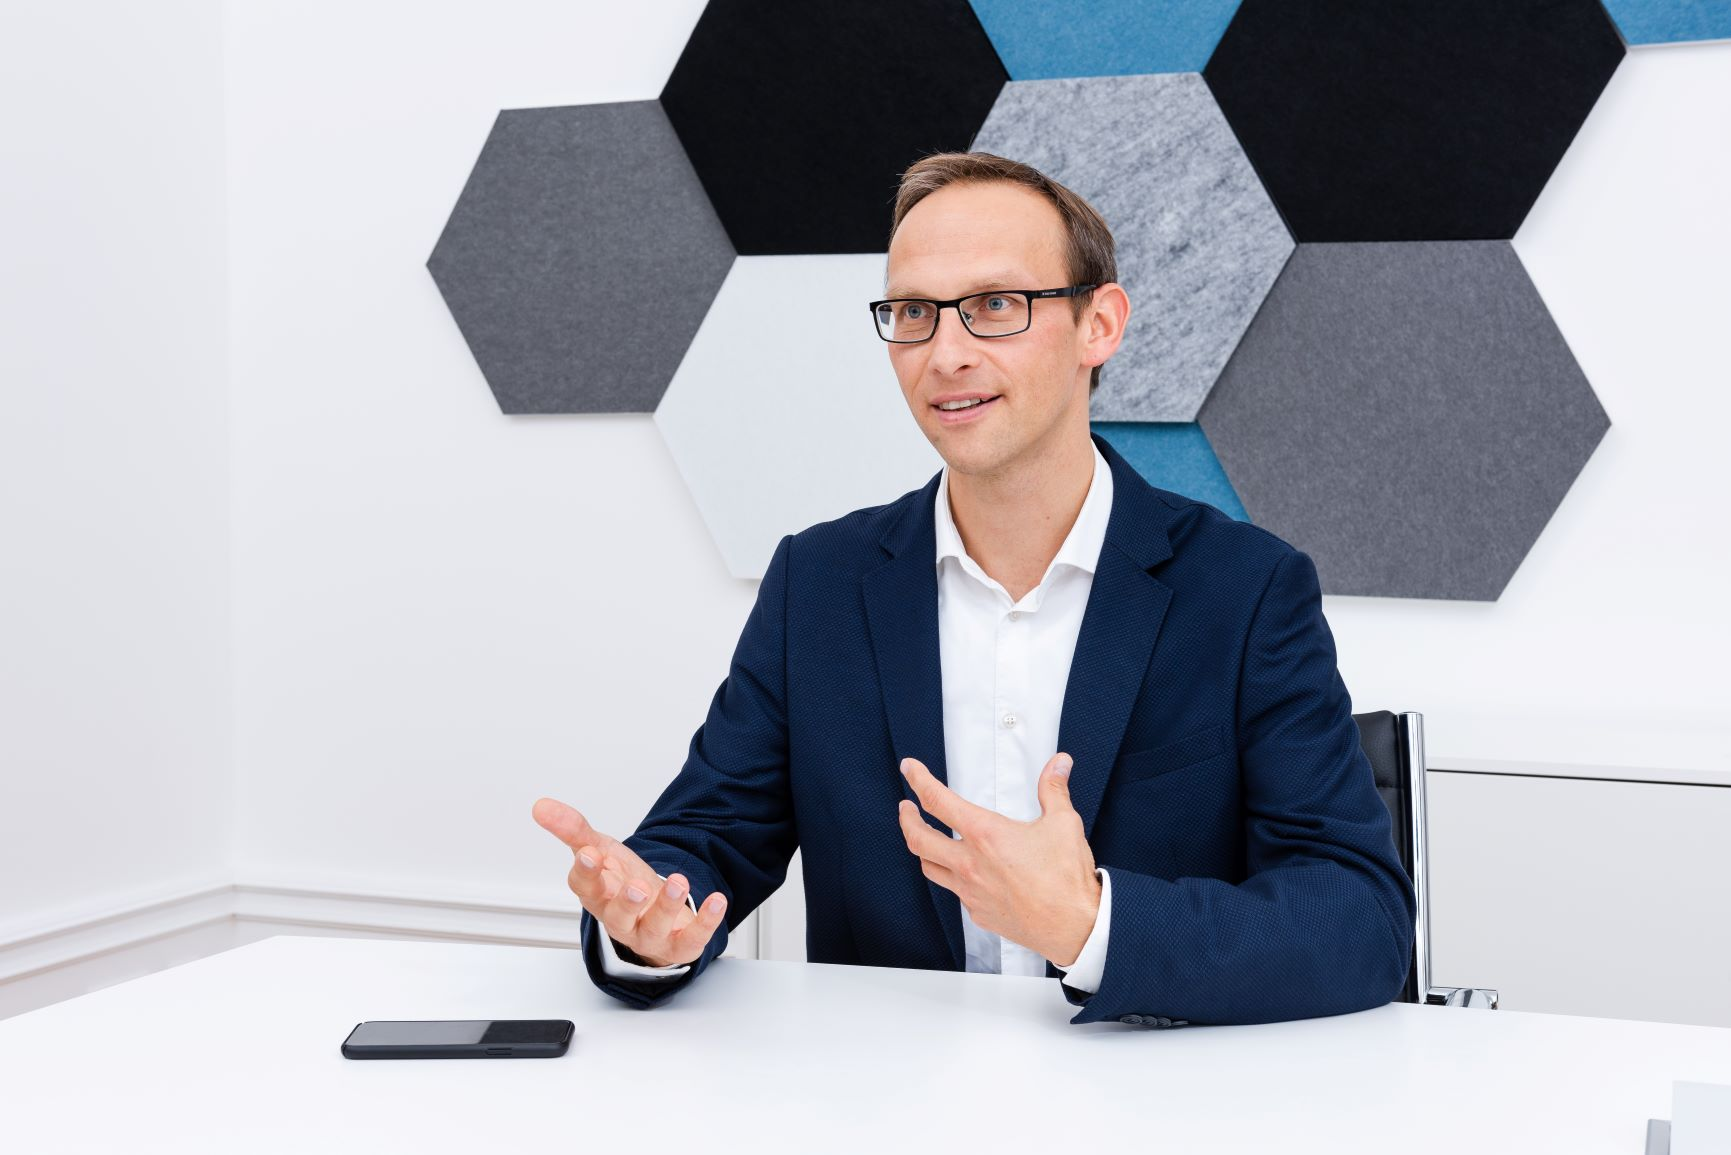 Interview mit Robo Advisor Kapilendo / Robo Advisory Markt 2020